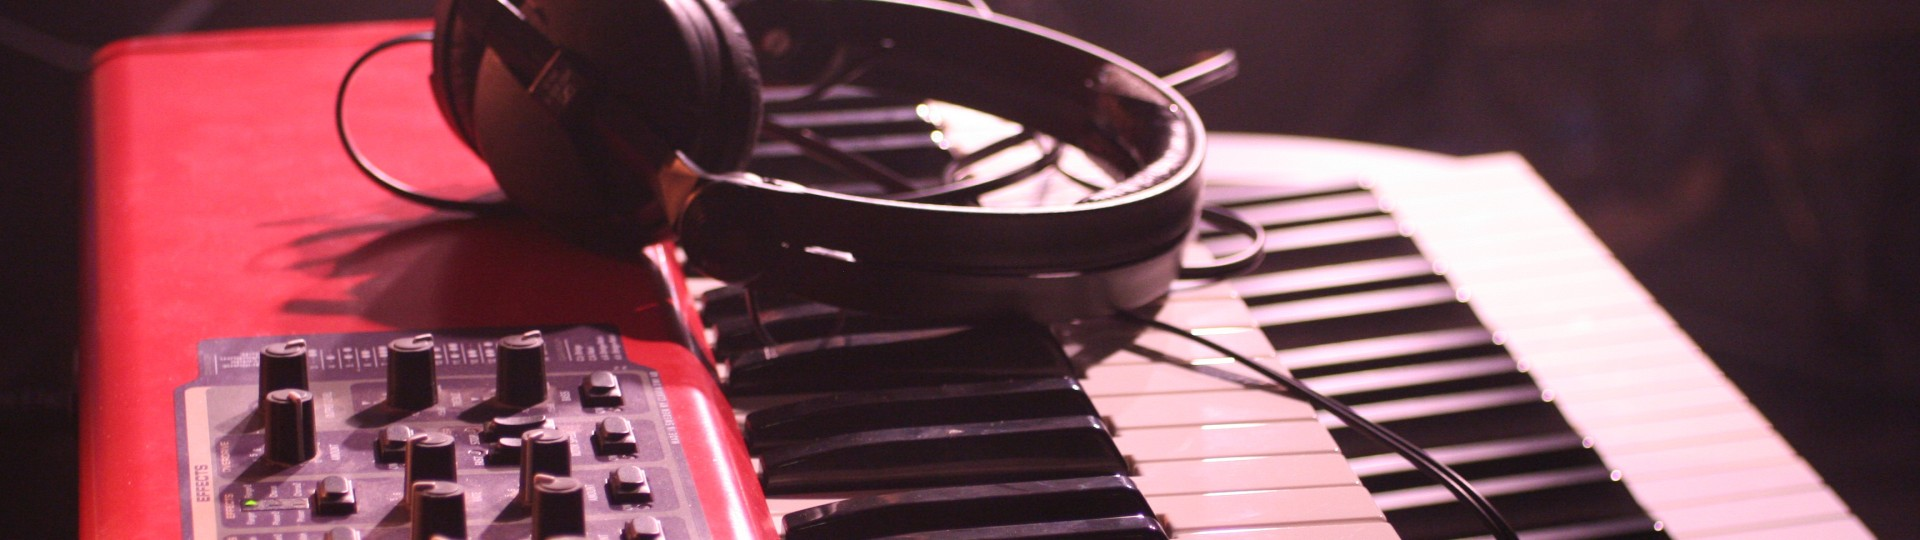 music-instruments-5-1422111